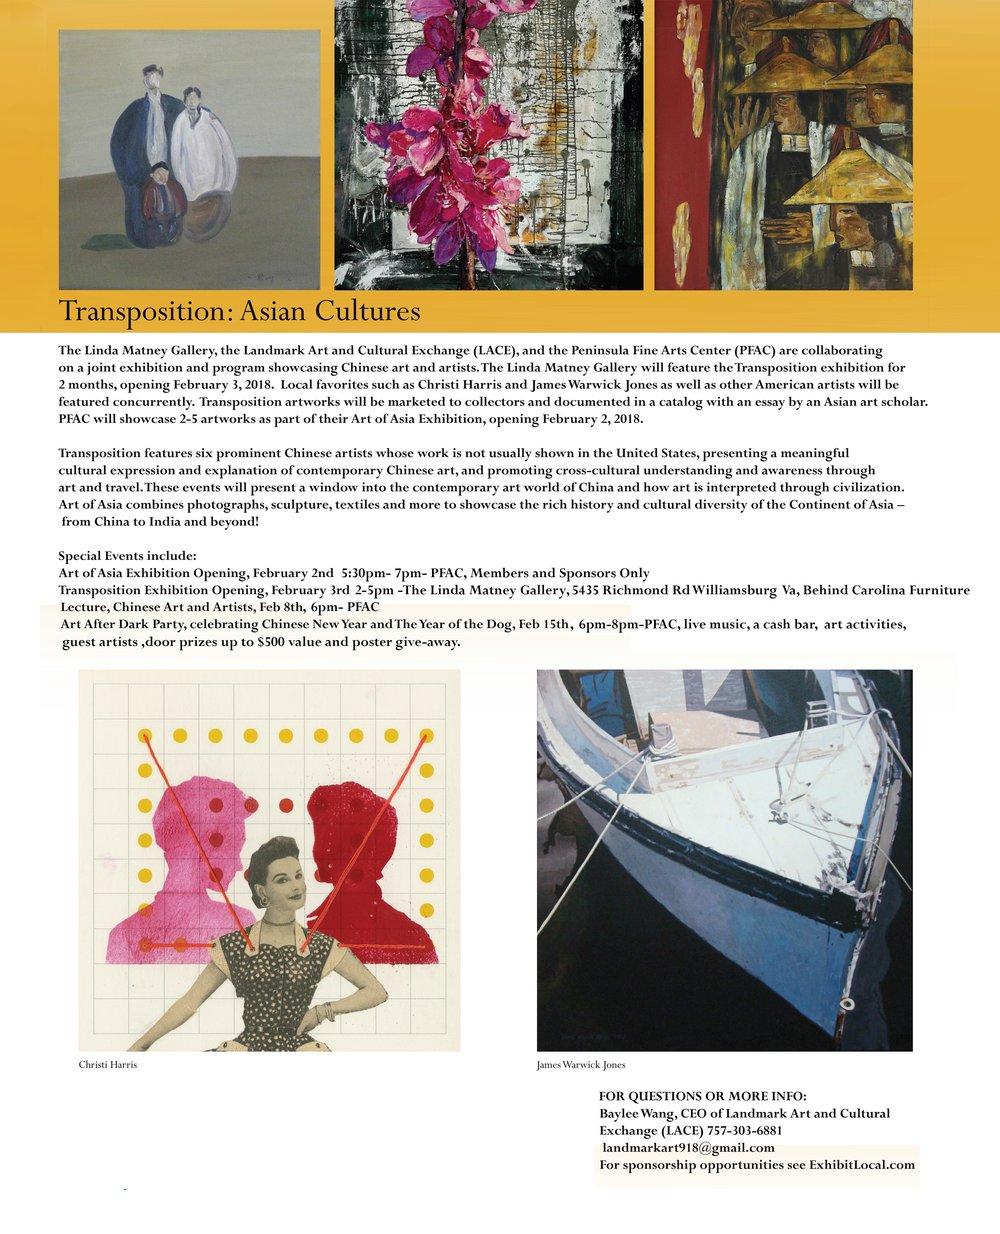 da8eb375-3470-4c46-933a-ba32878b11df-original.jpeg. Transposition: Asian  Cultures